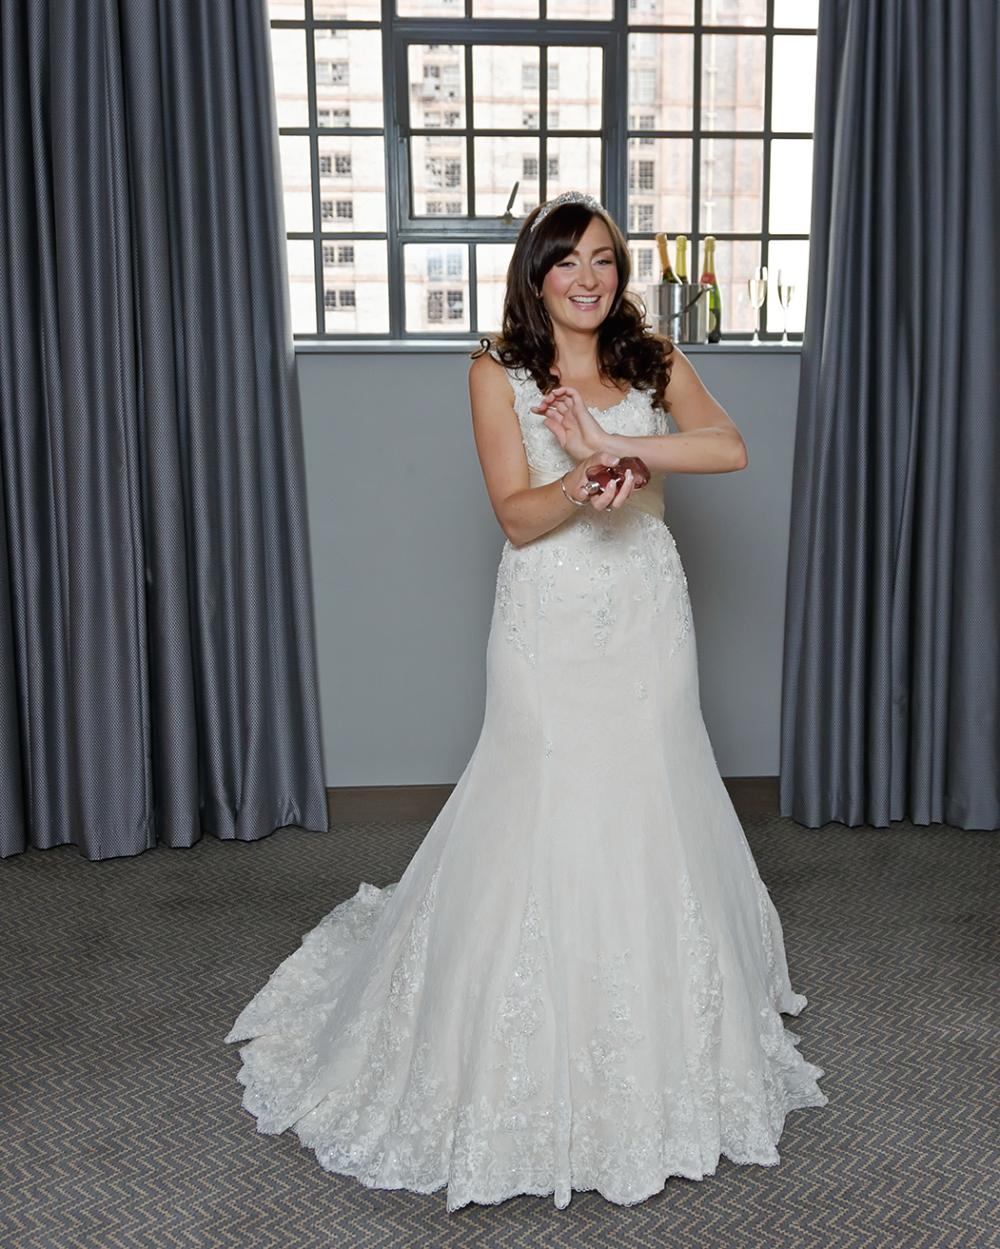 Titanic Hotel Wedding Bride Preparation perfume